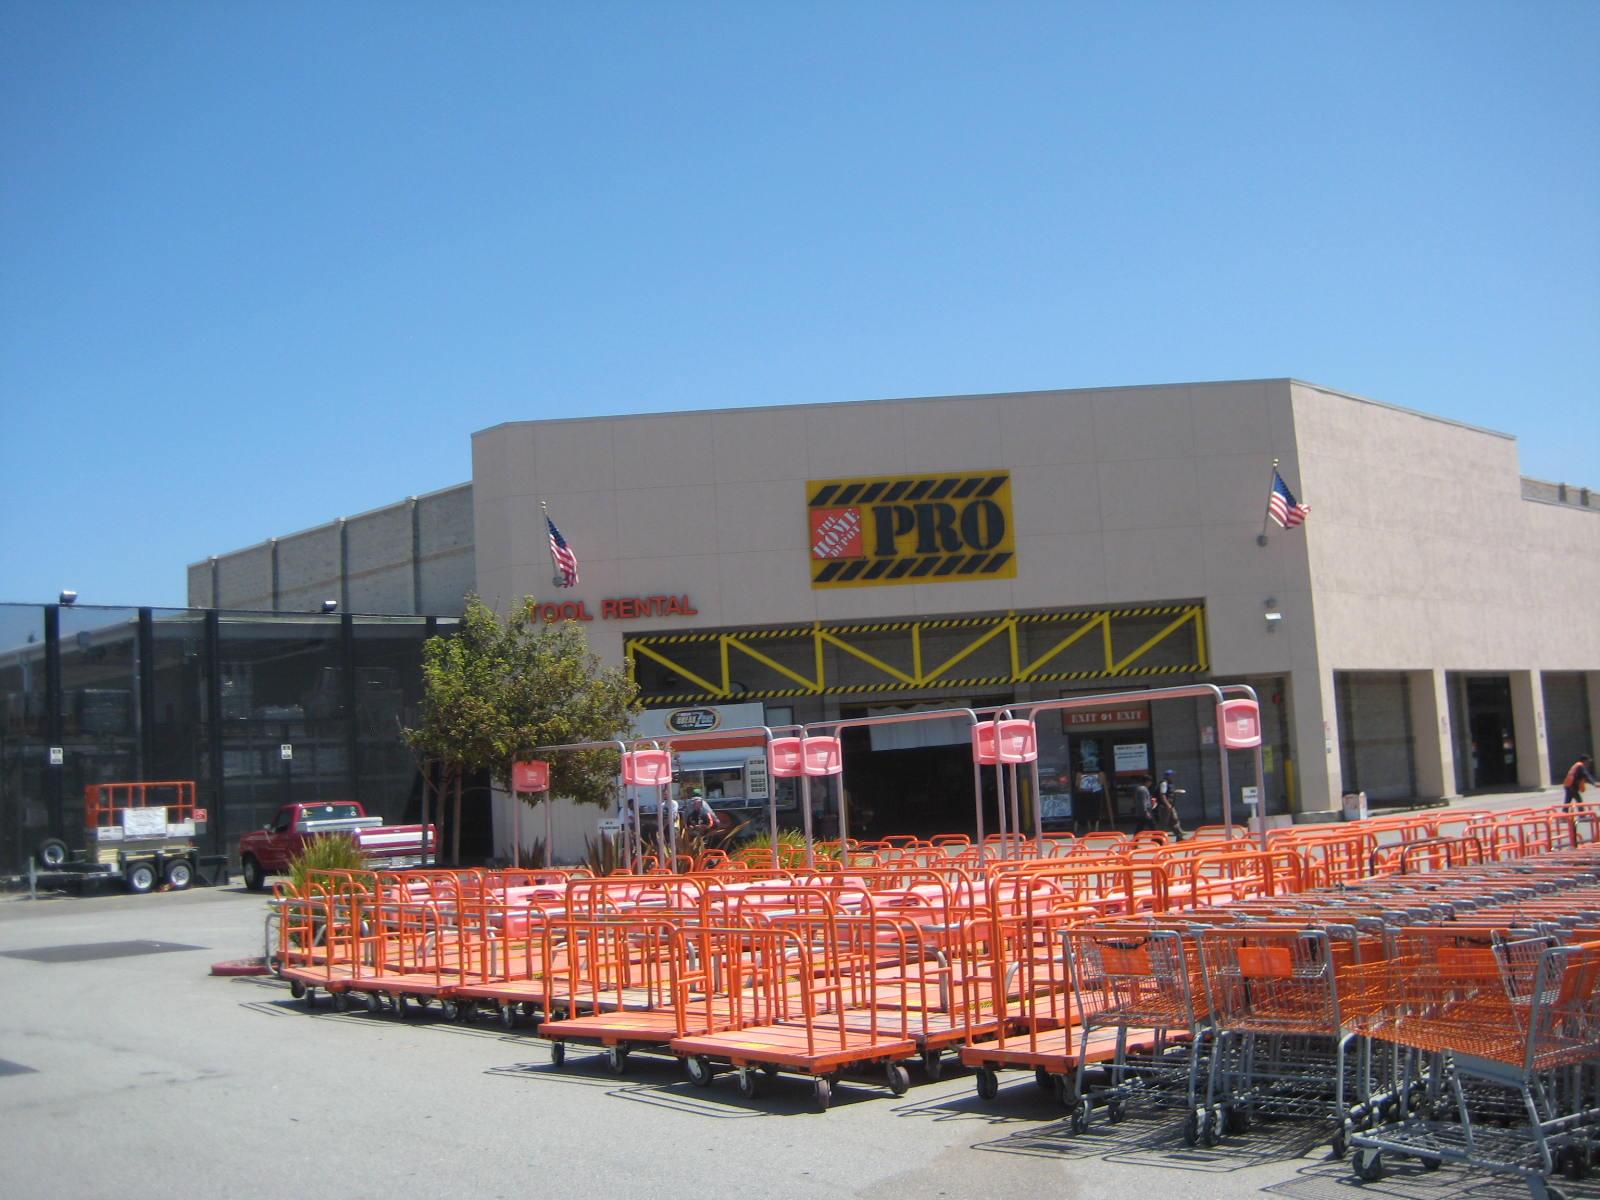 Home Depot Repairs : The home depot pro colma california store shop